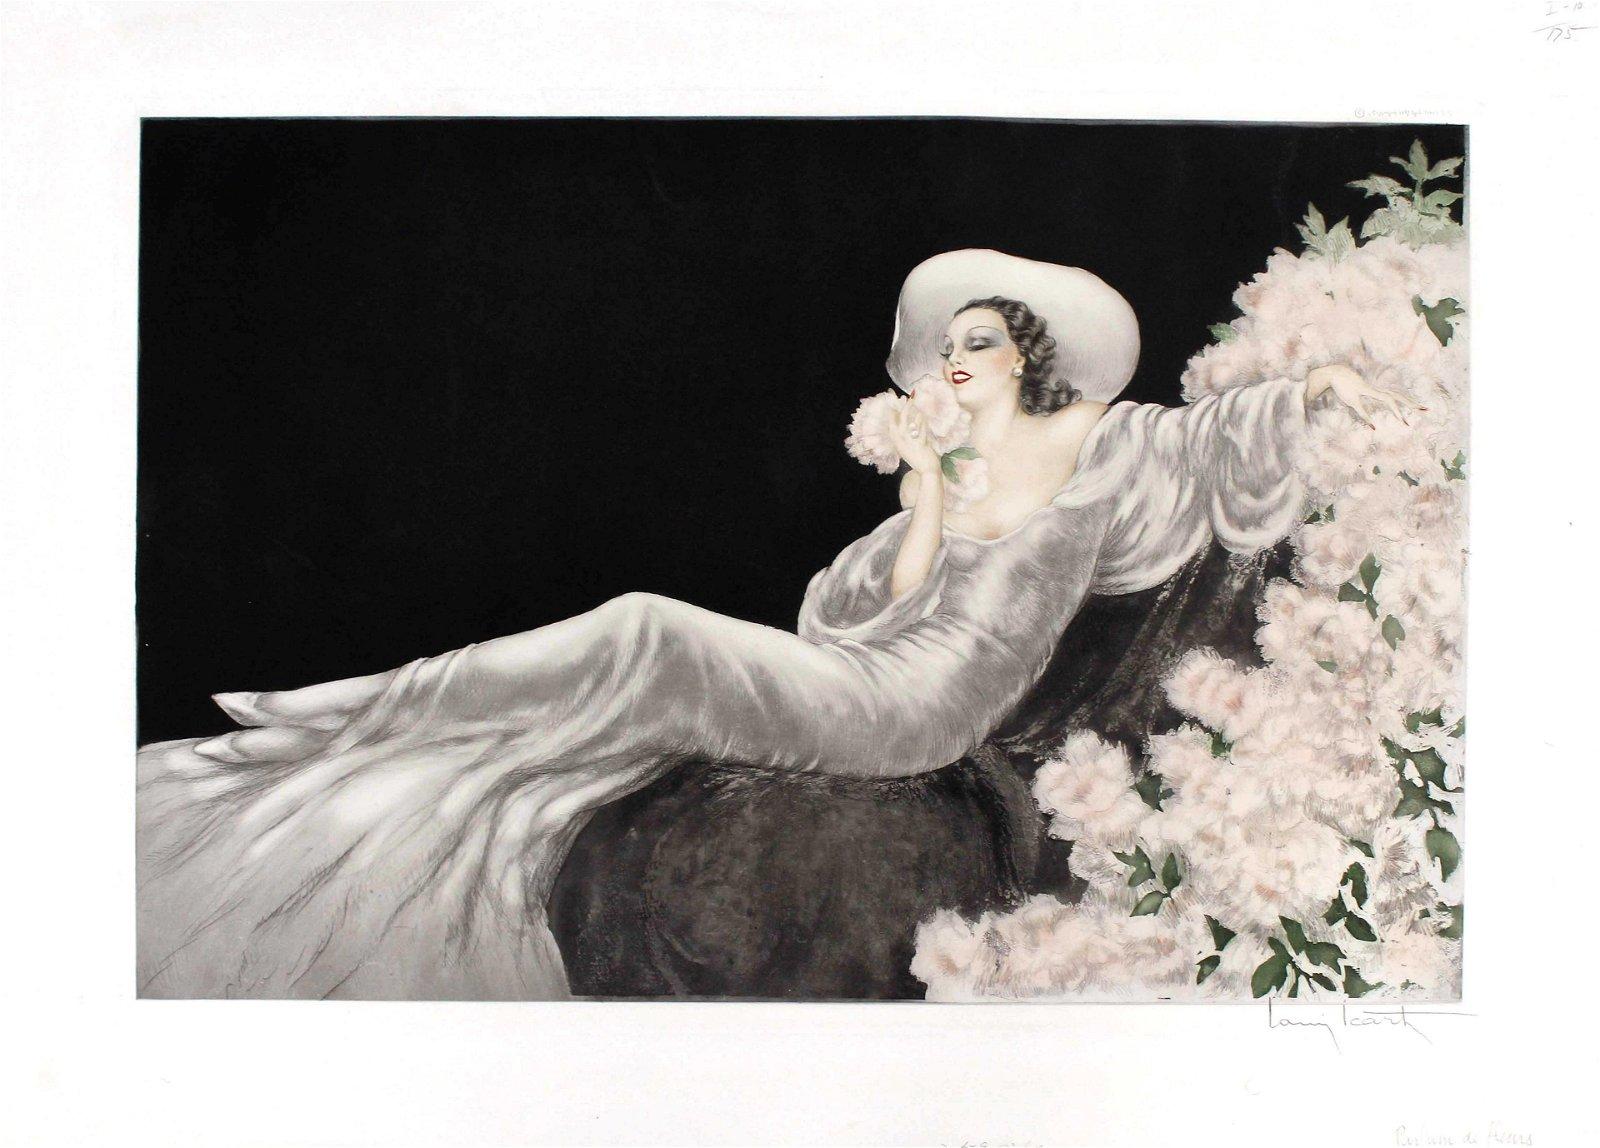 Louis Icart - Love's Blossom